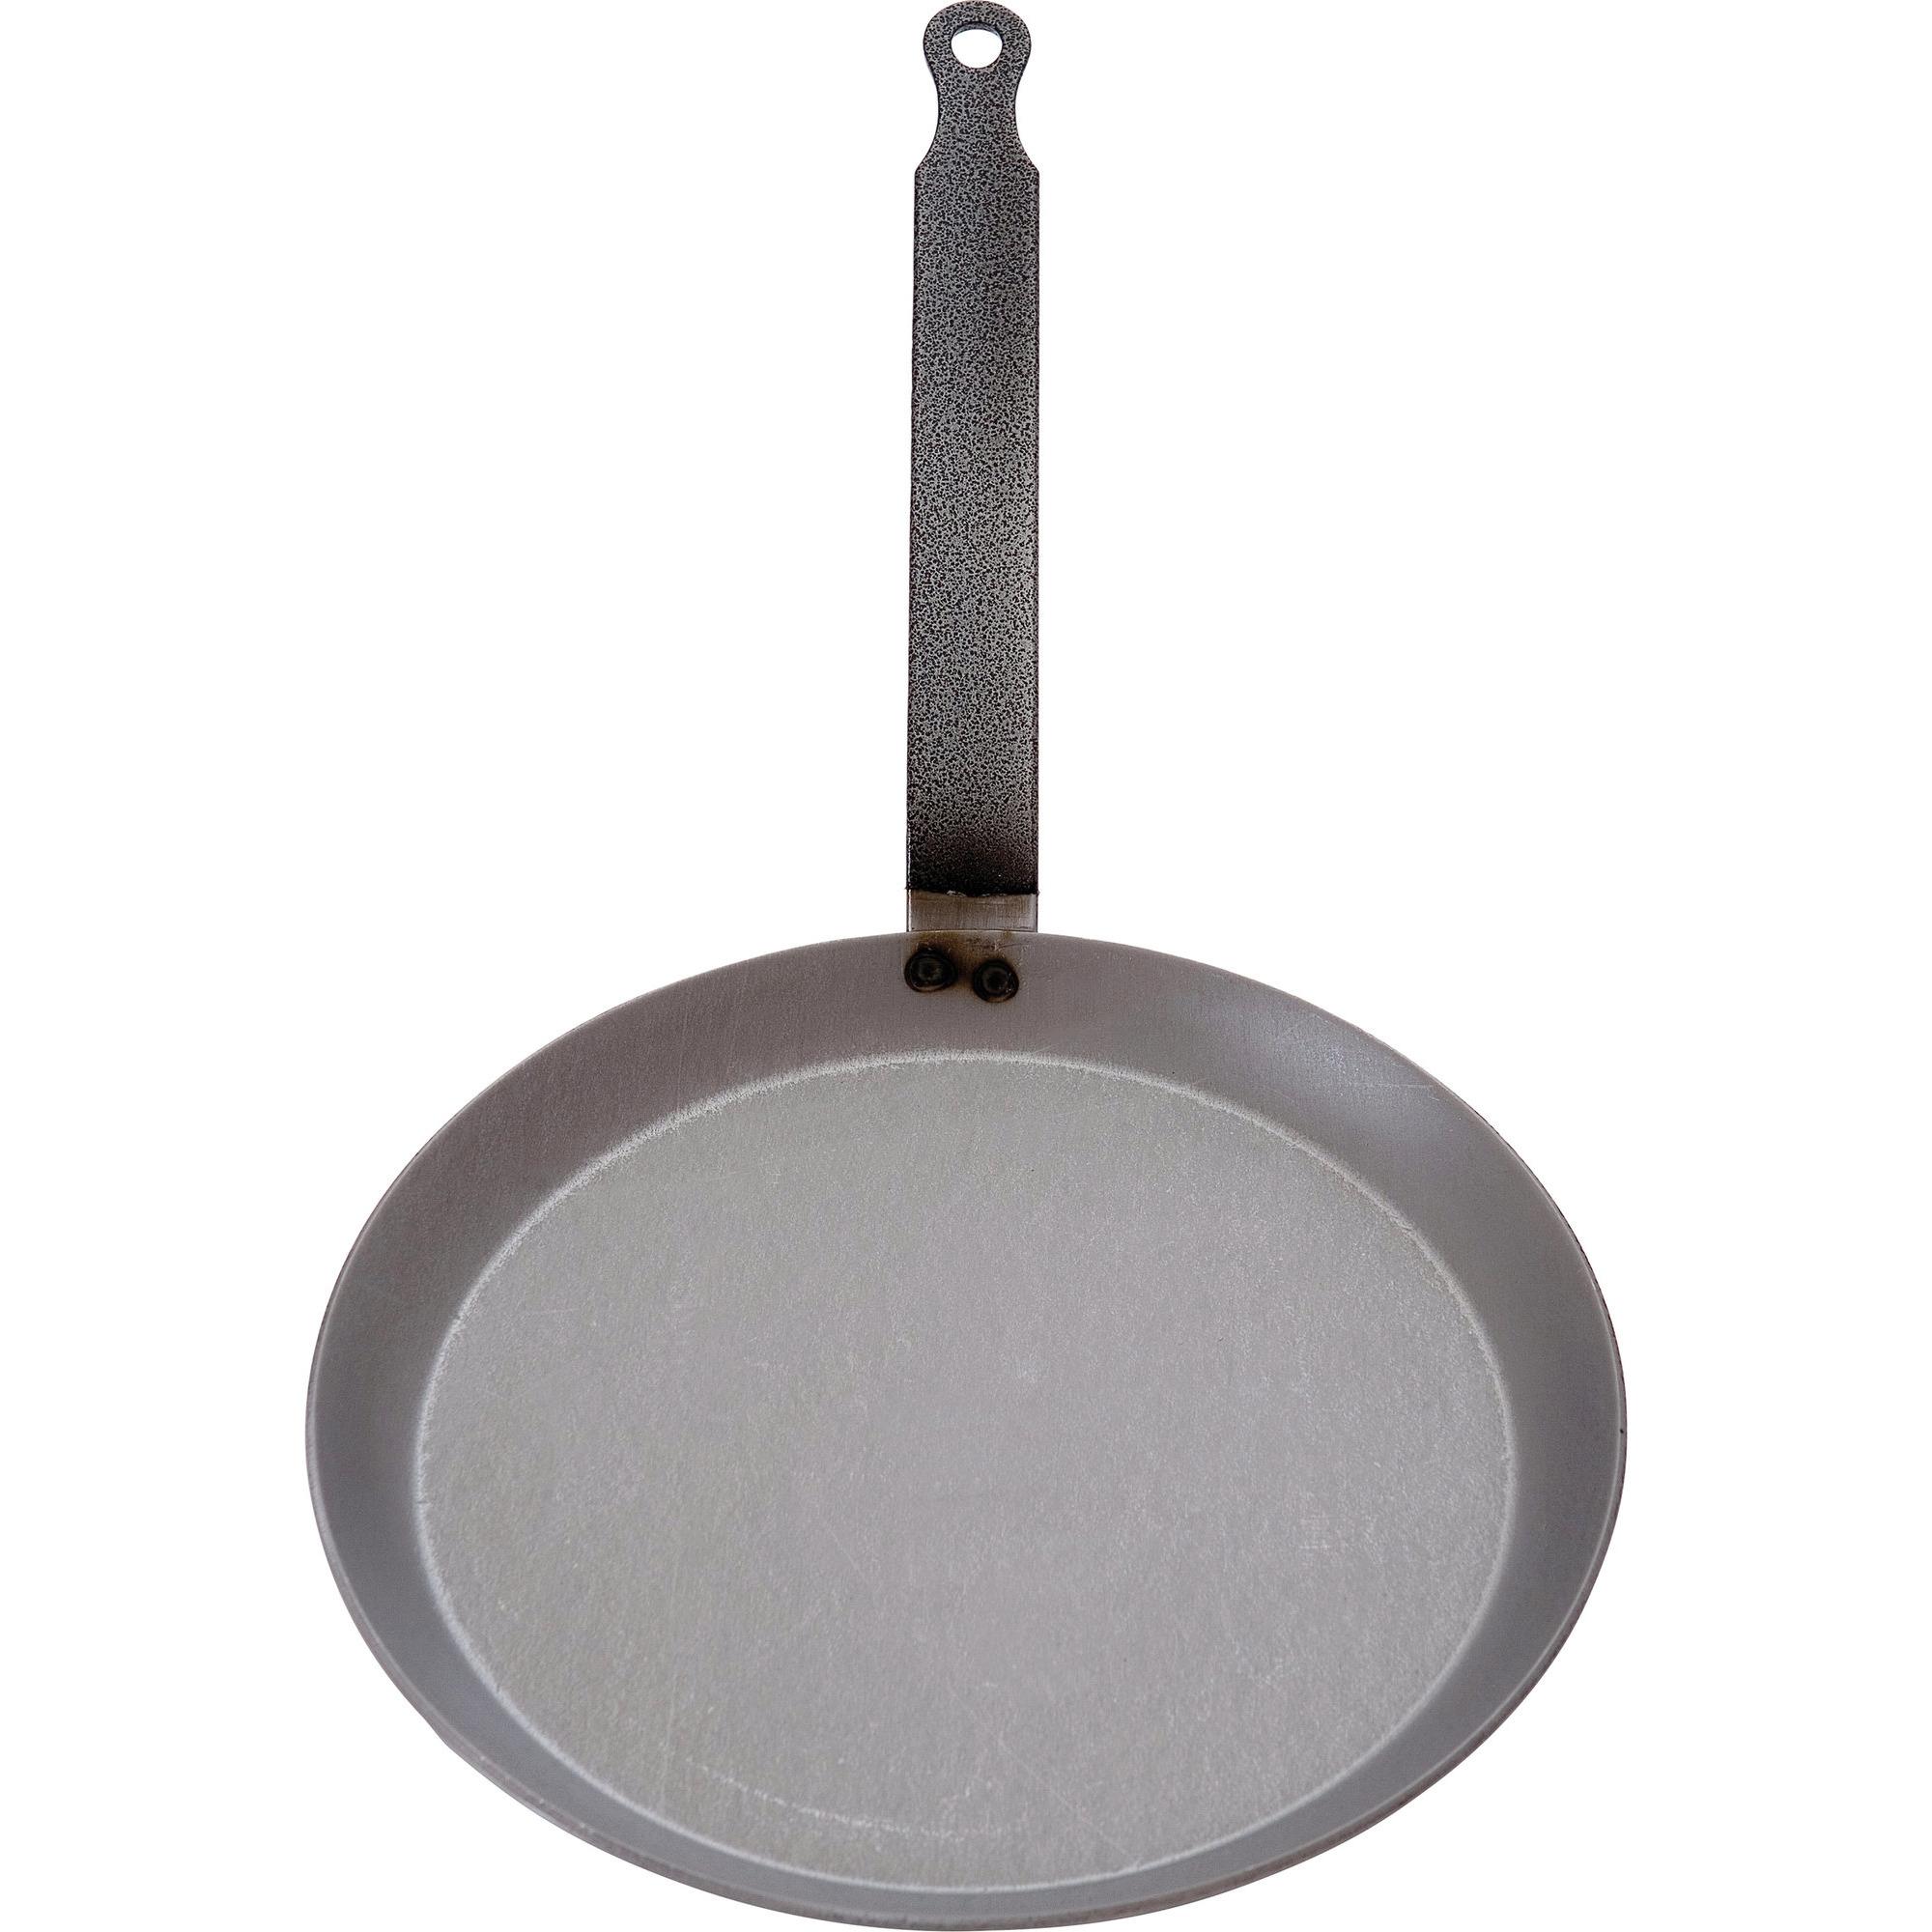 Mauviel Crêpe/pannkakspanna plåt Ø 24 cm